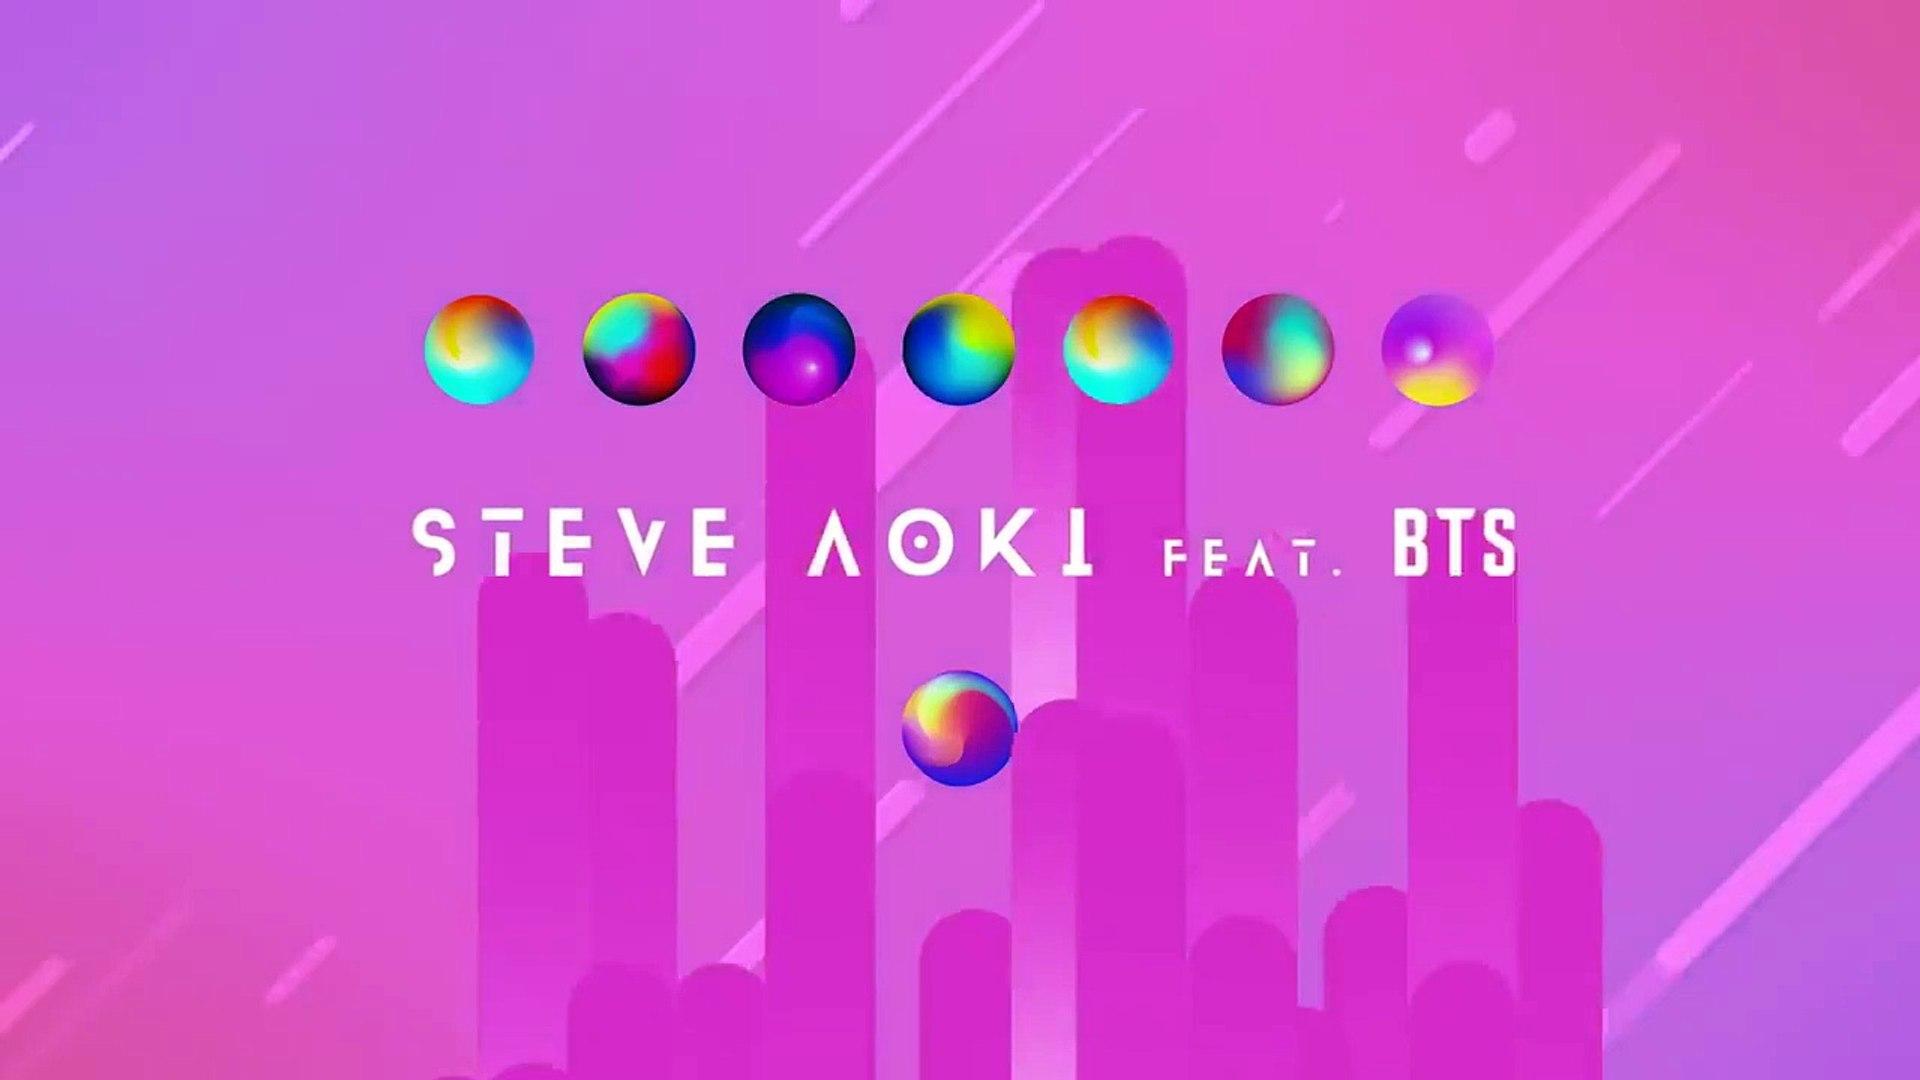 Steve Aoki Waste It On Me Feat Bts Lyric Video Ultra Music